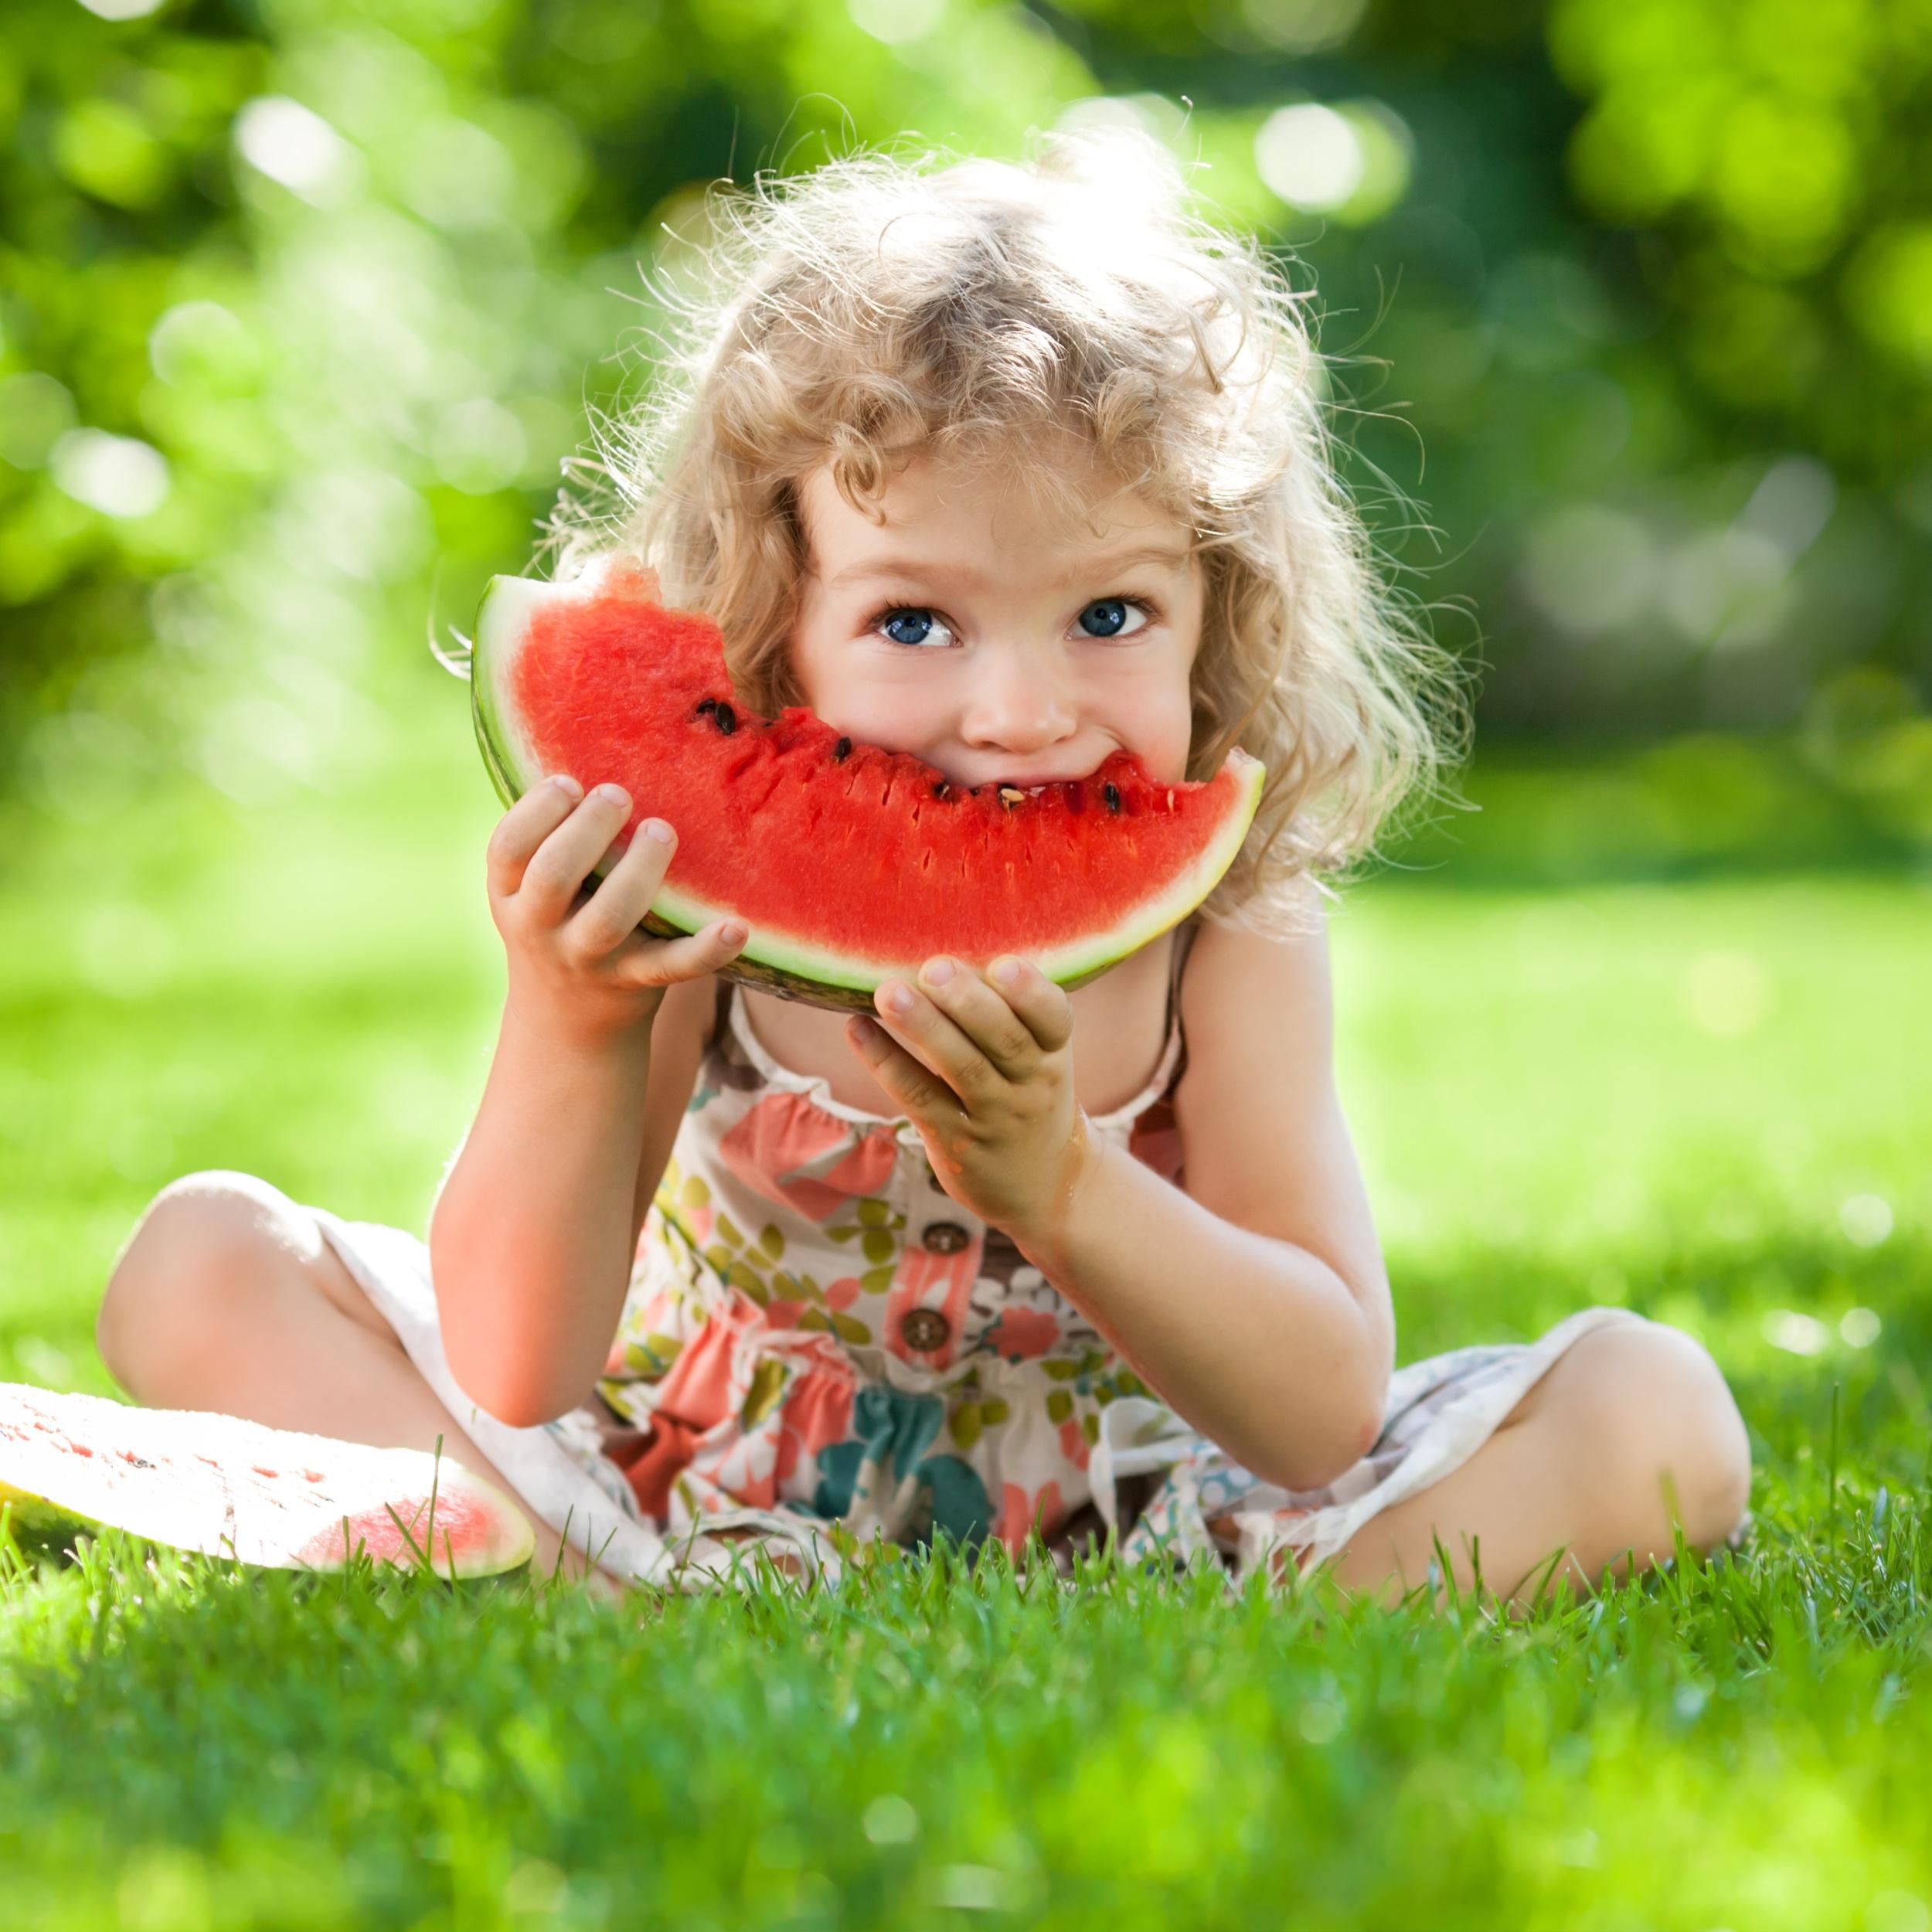 Fruits and Veggies Fun for Preschoolers